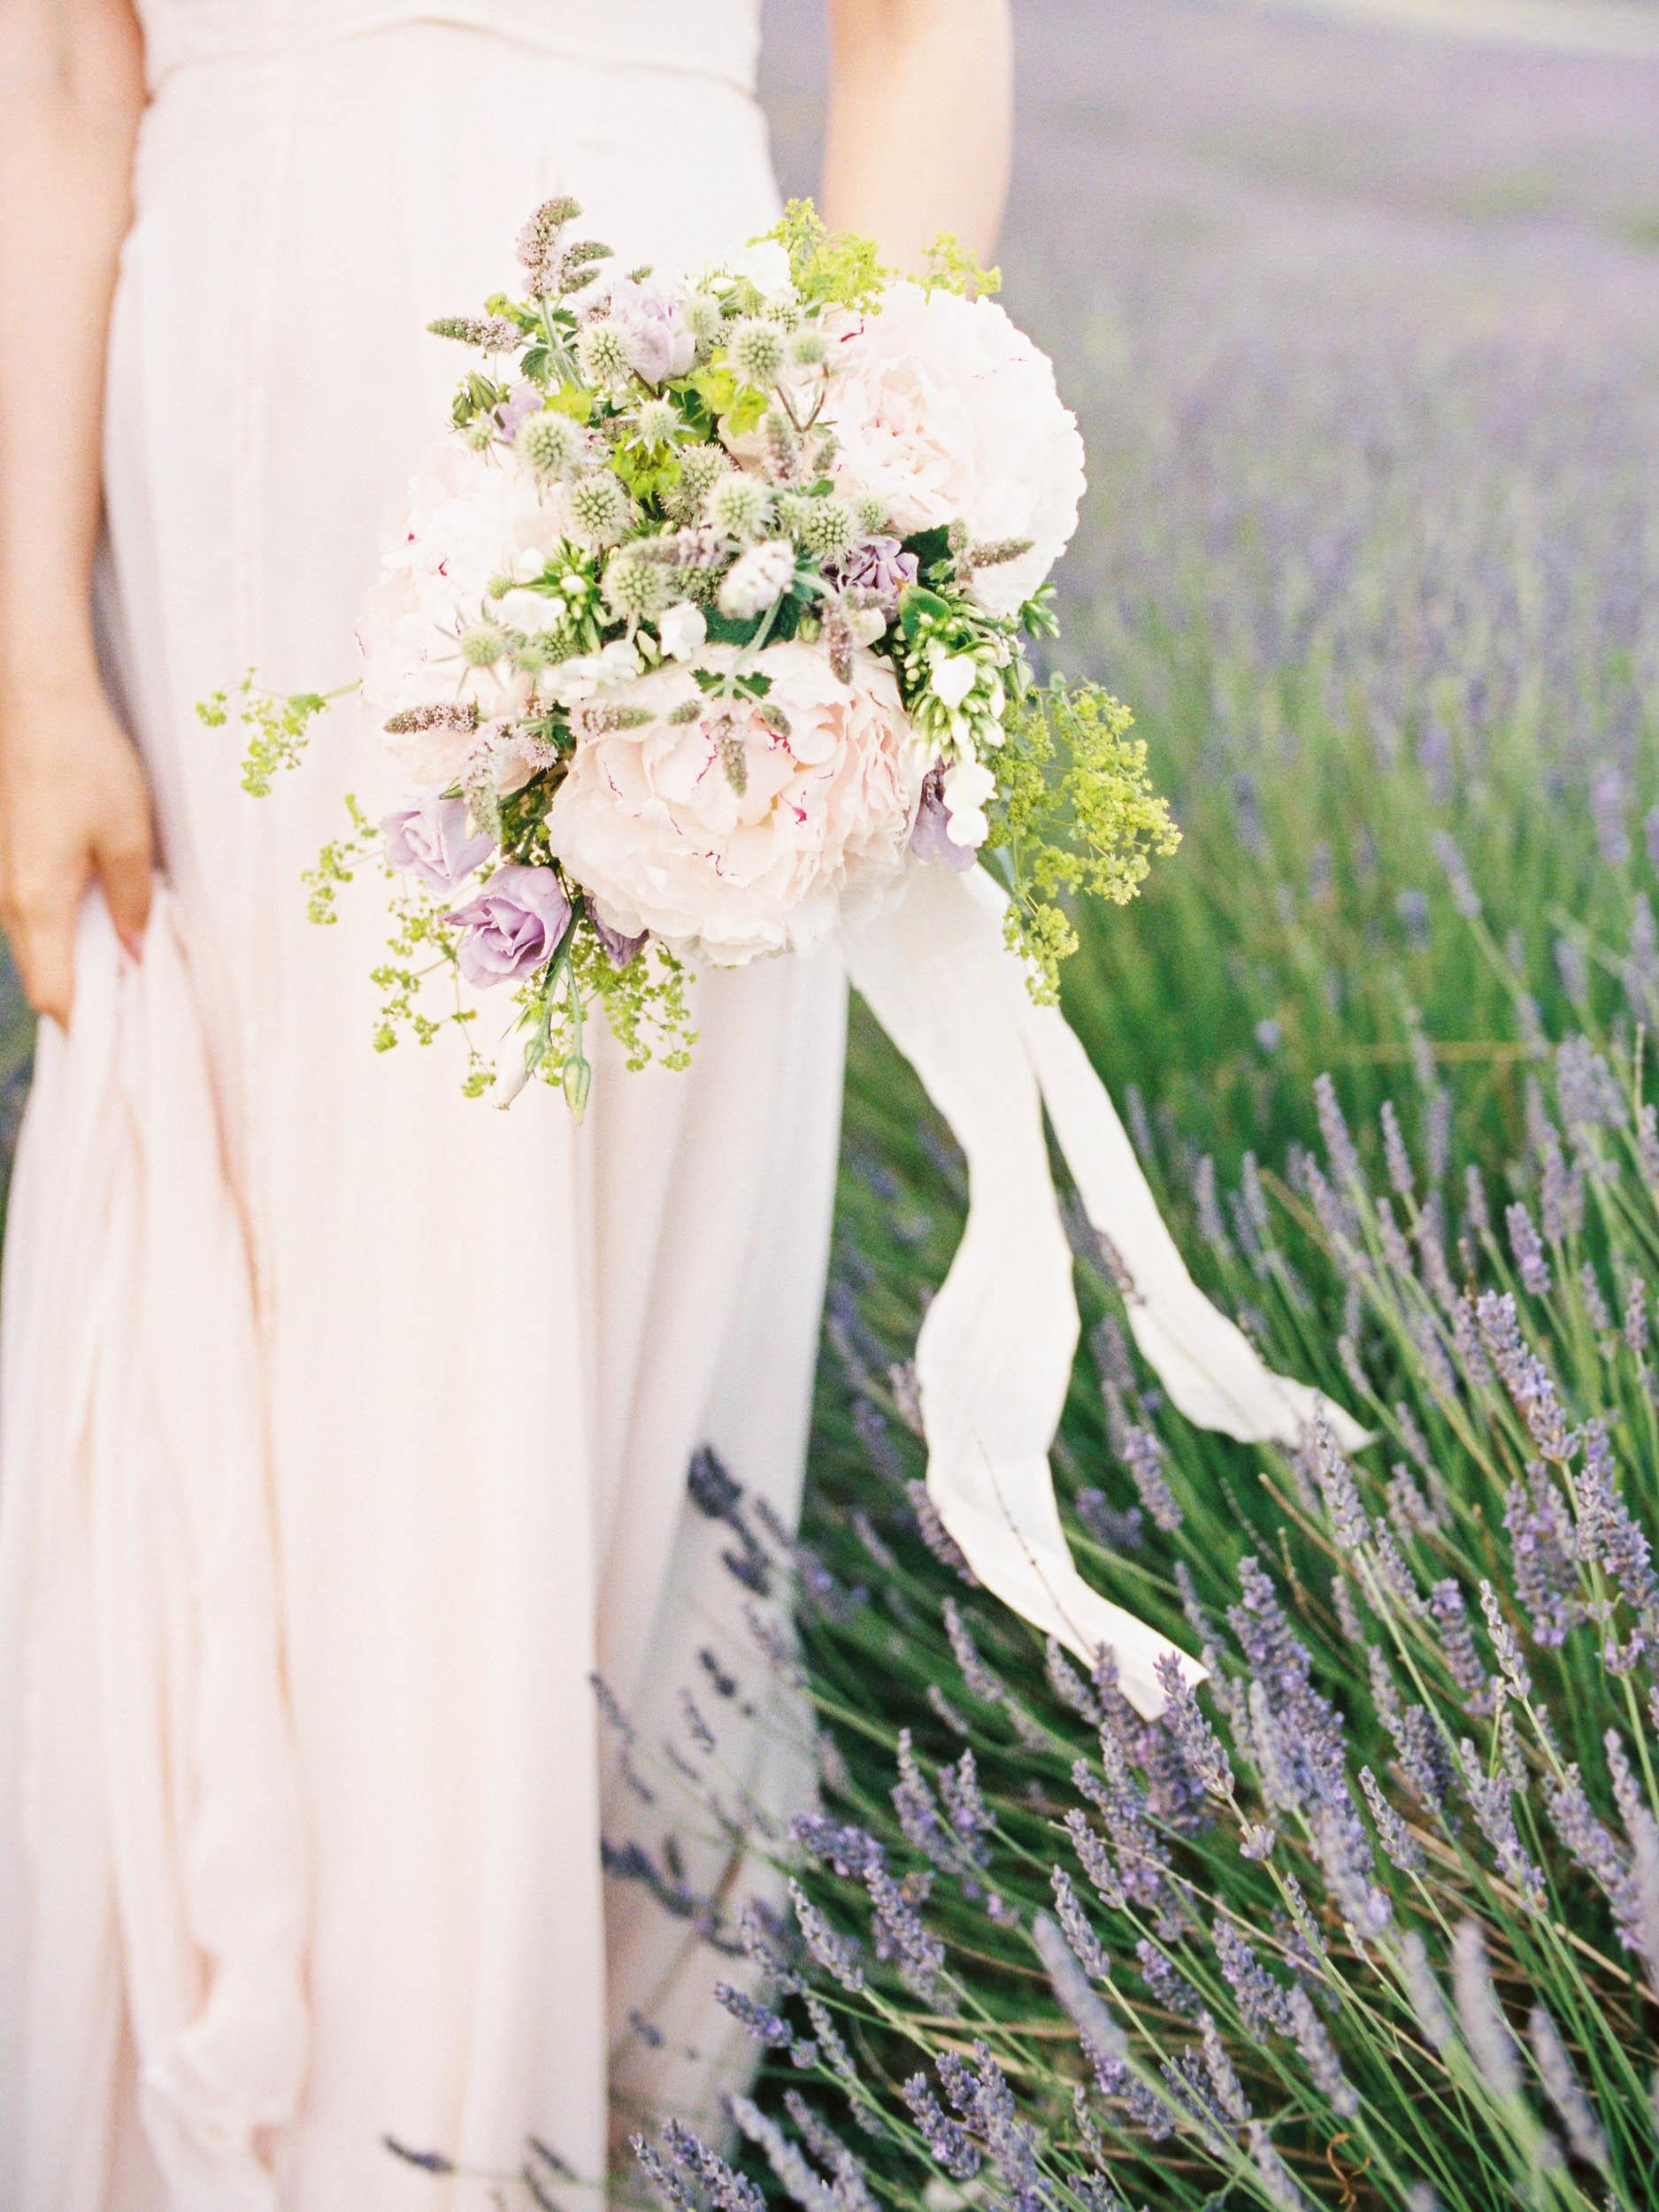 Amy O'Boyle Photography- Destination & UK Fine Art Film Wedding Photographer- Hitchin Lavender Engagement Shoot-8.jpg